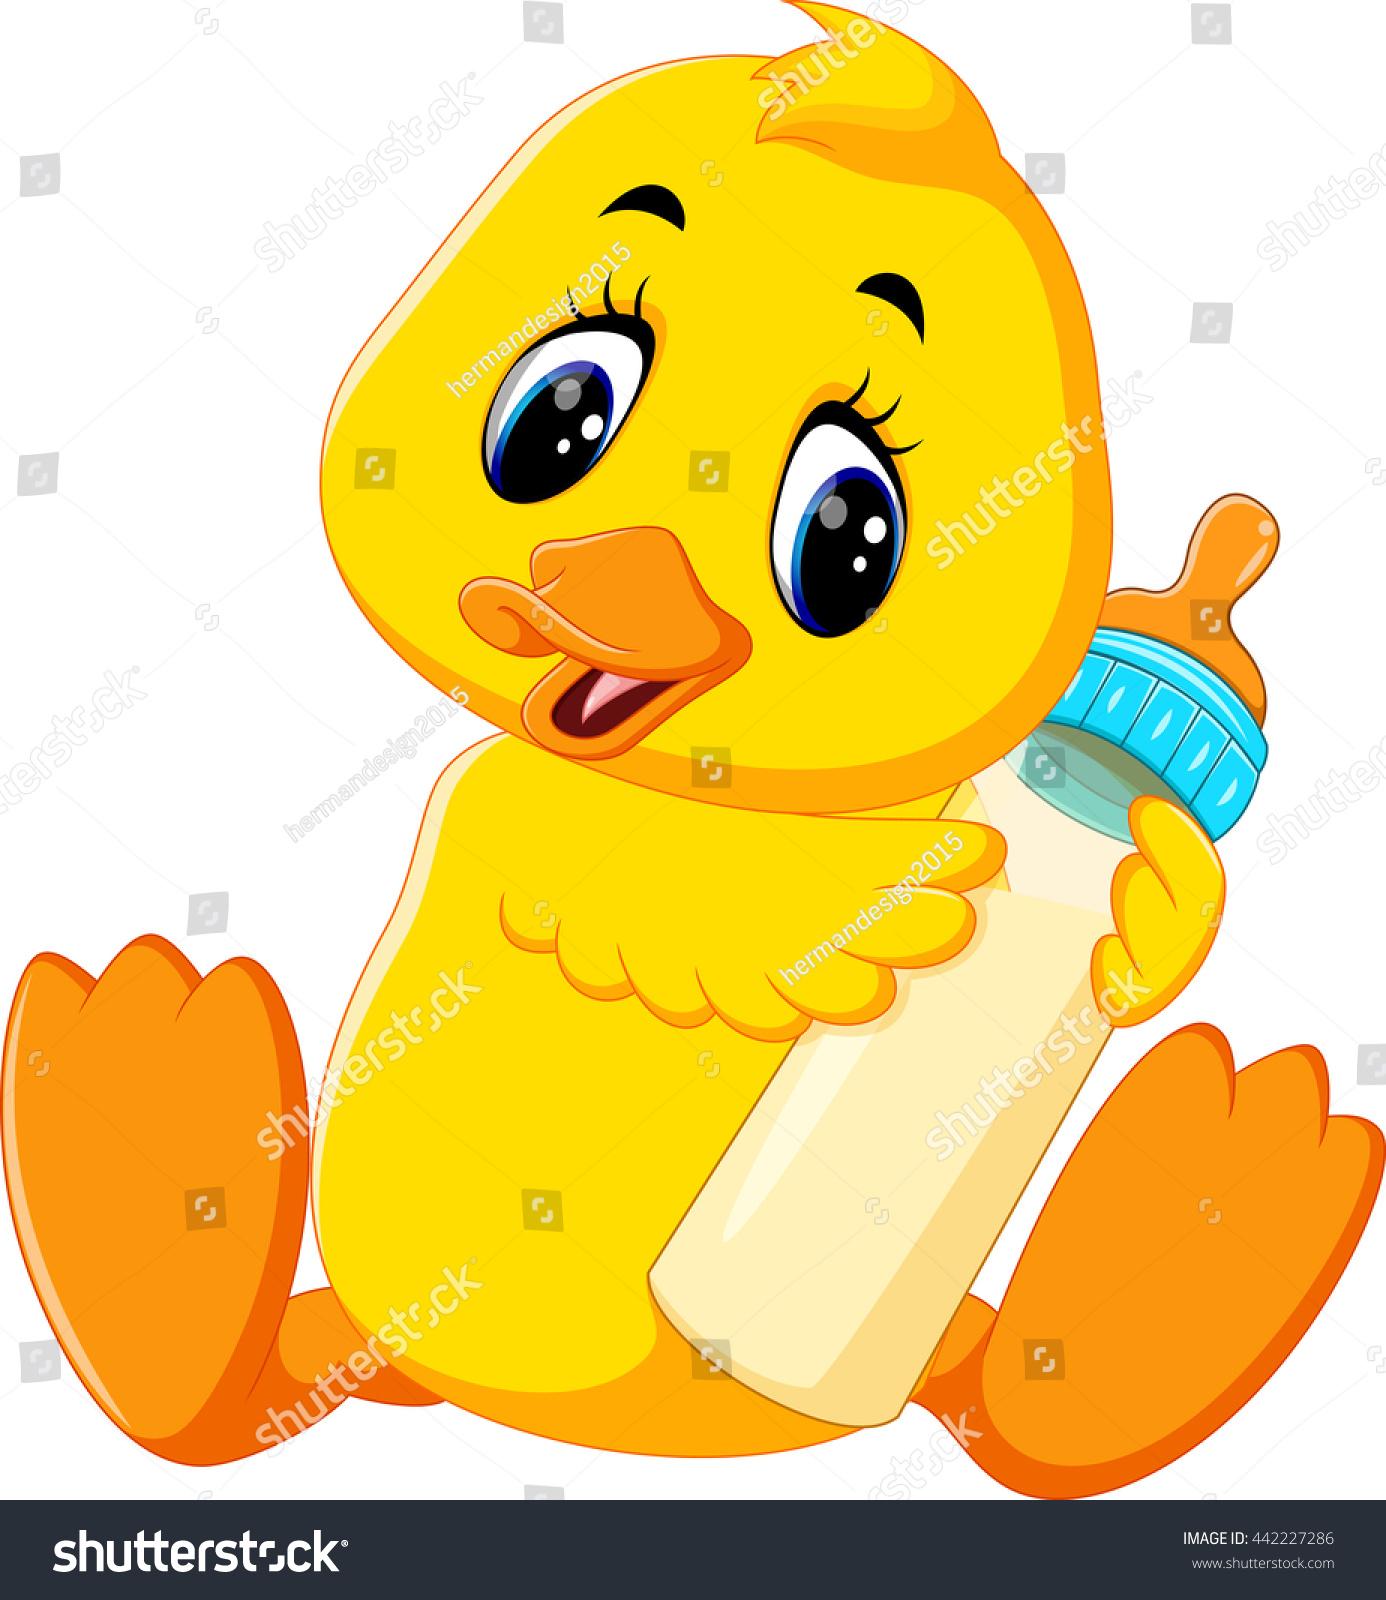 Cartoon baby duck - photo#13